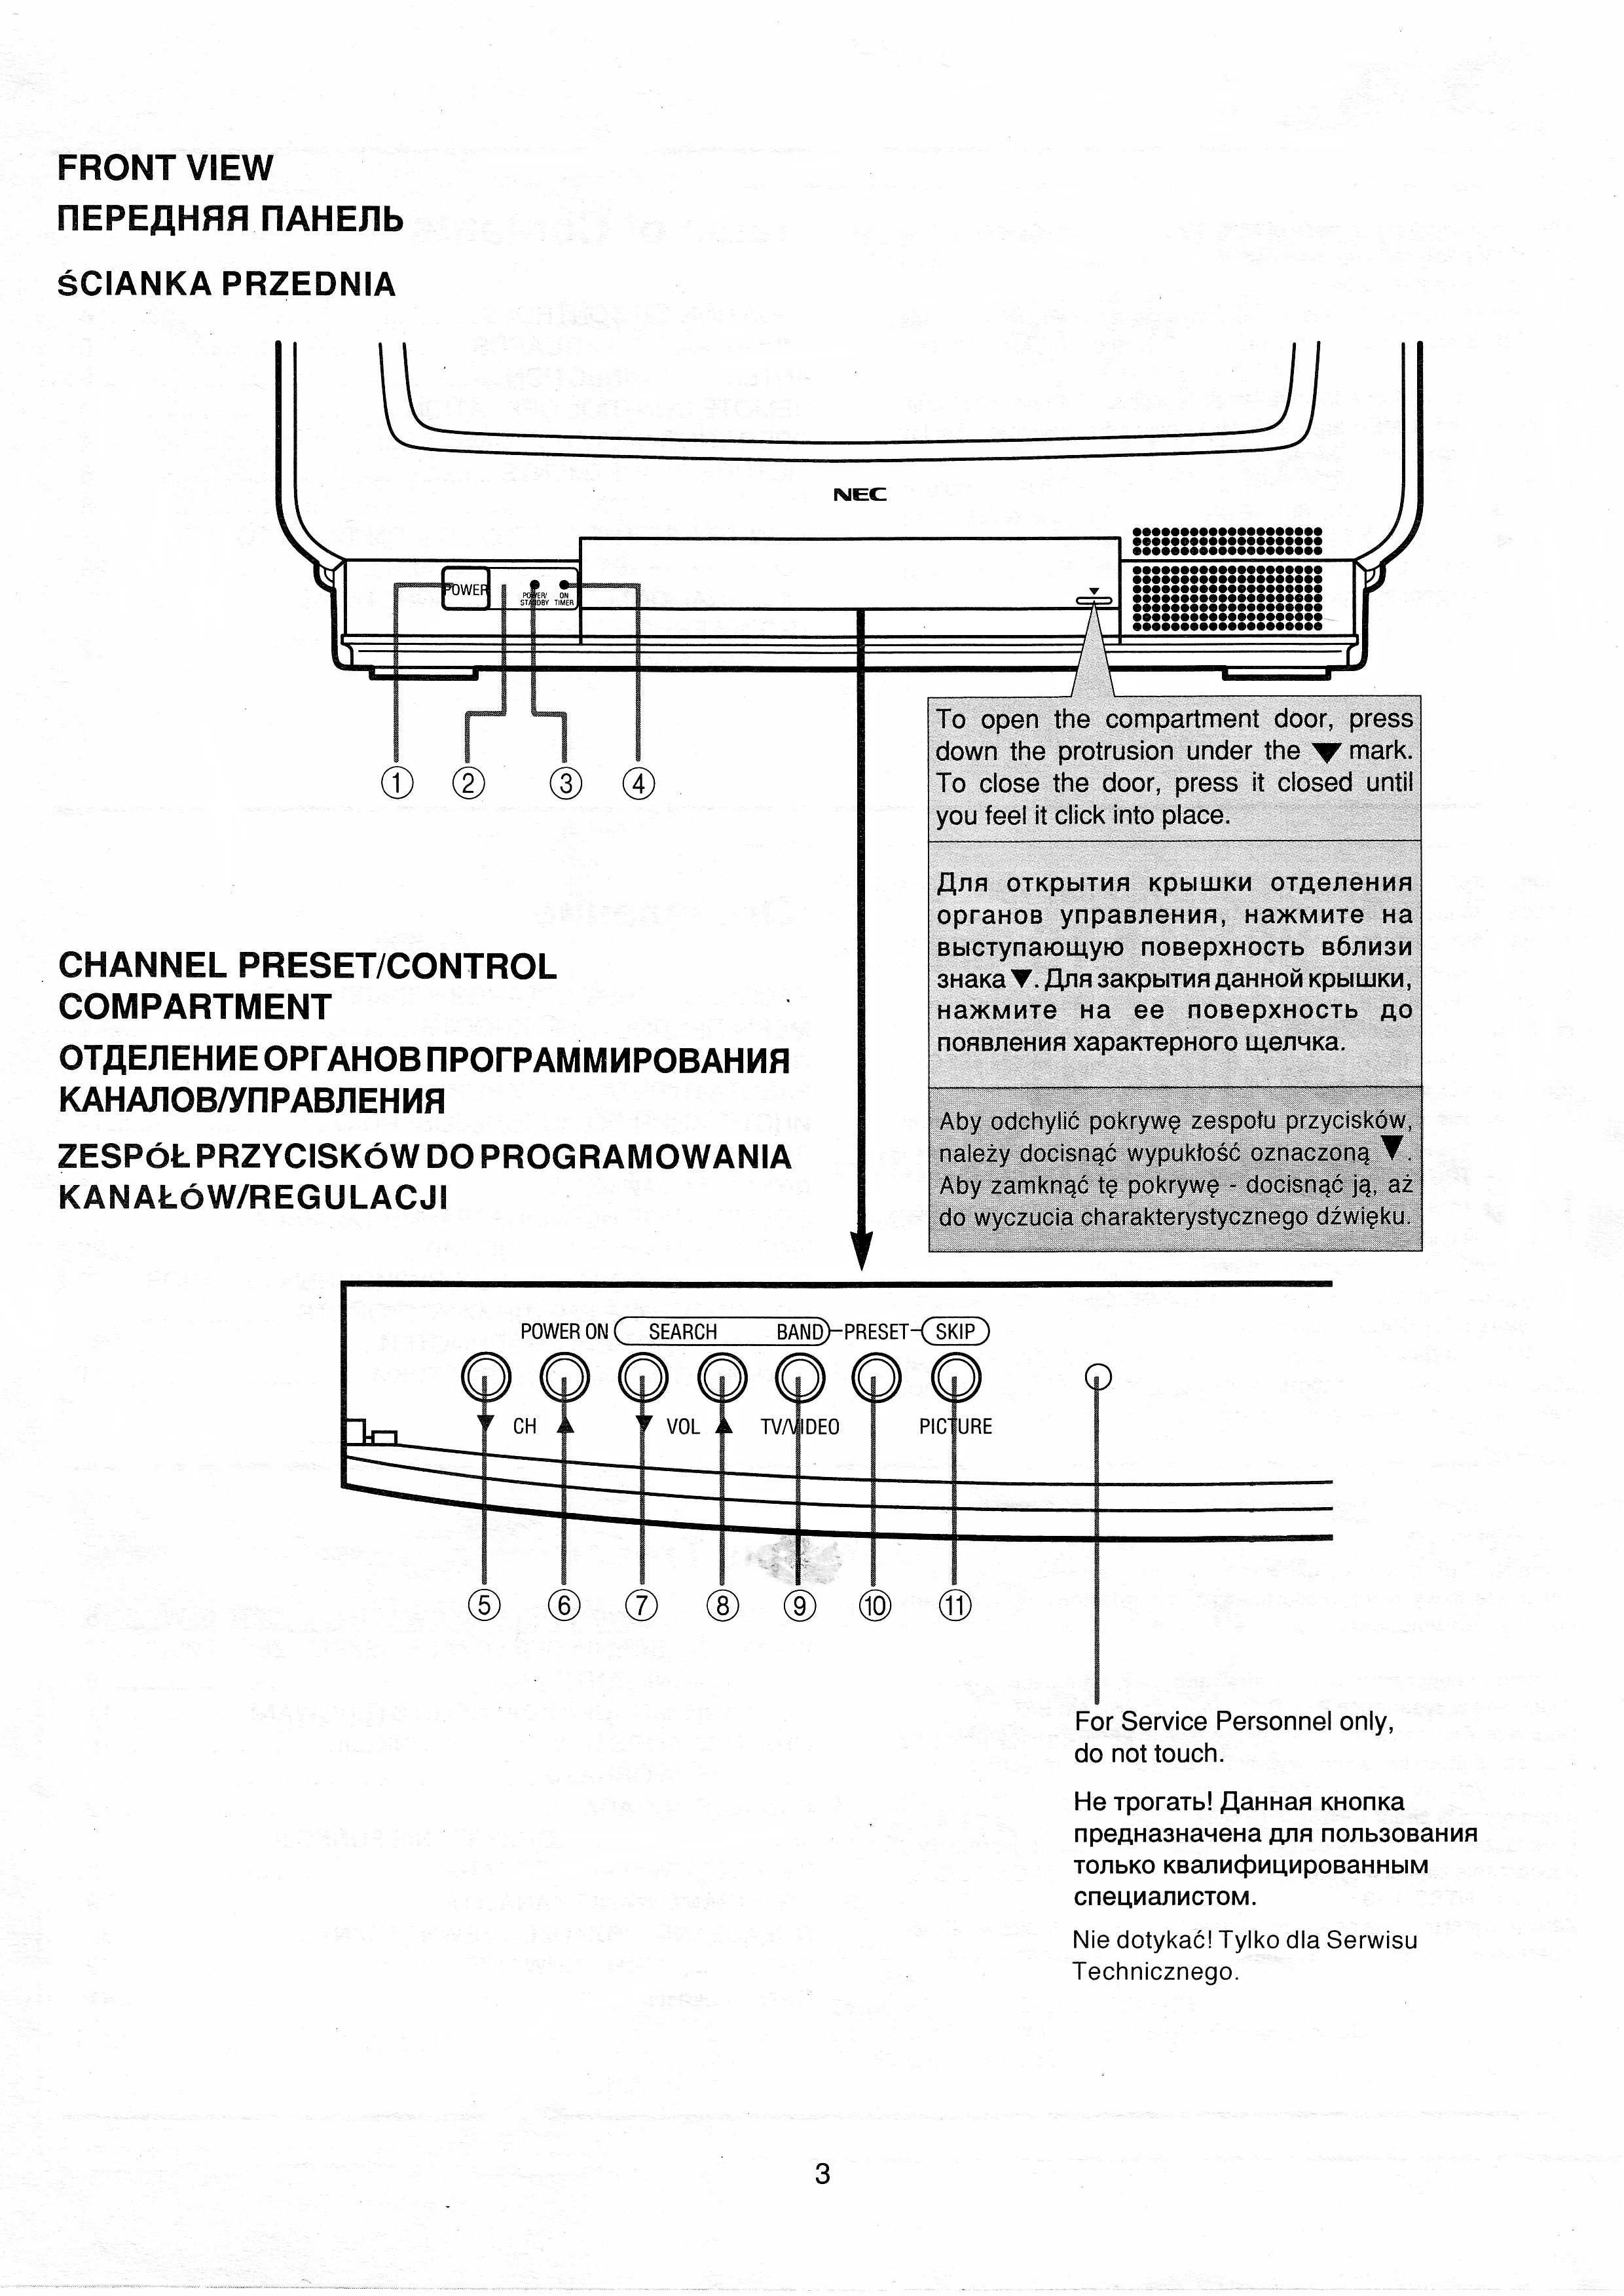 Инструкция телевизора nec